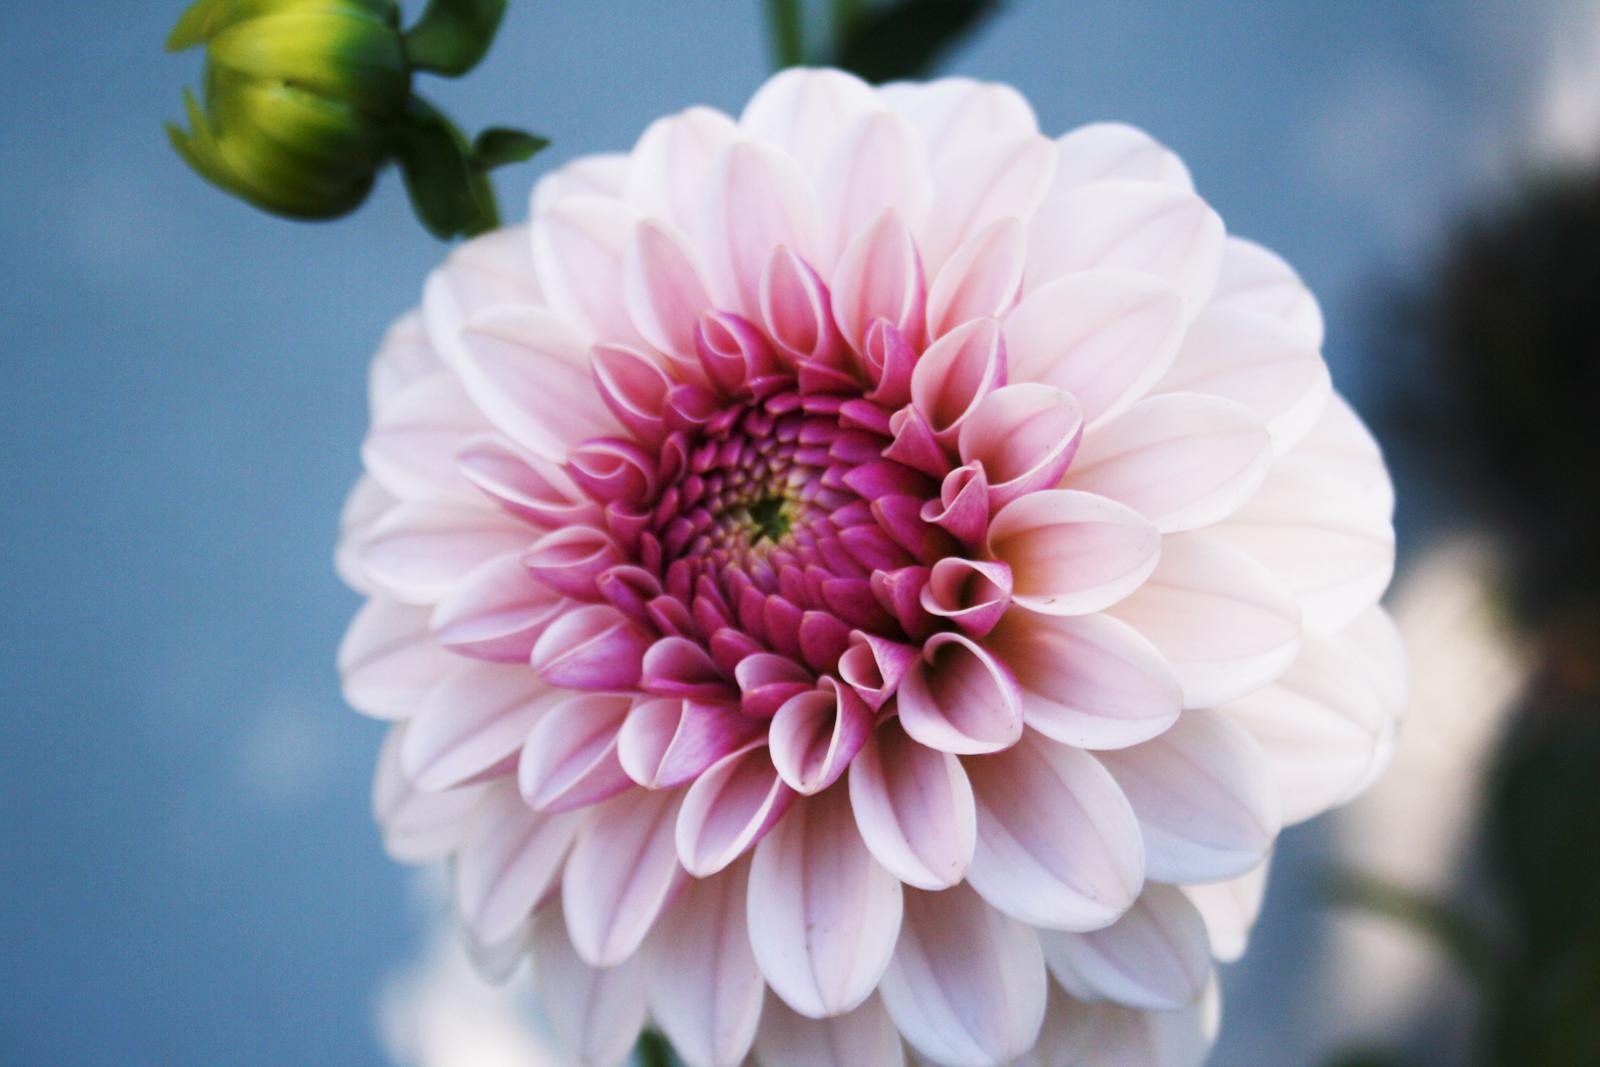 Jarne a letne aranzmany a dekoracie - Z nasej zahrady...